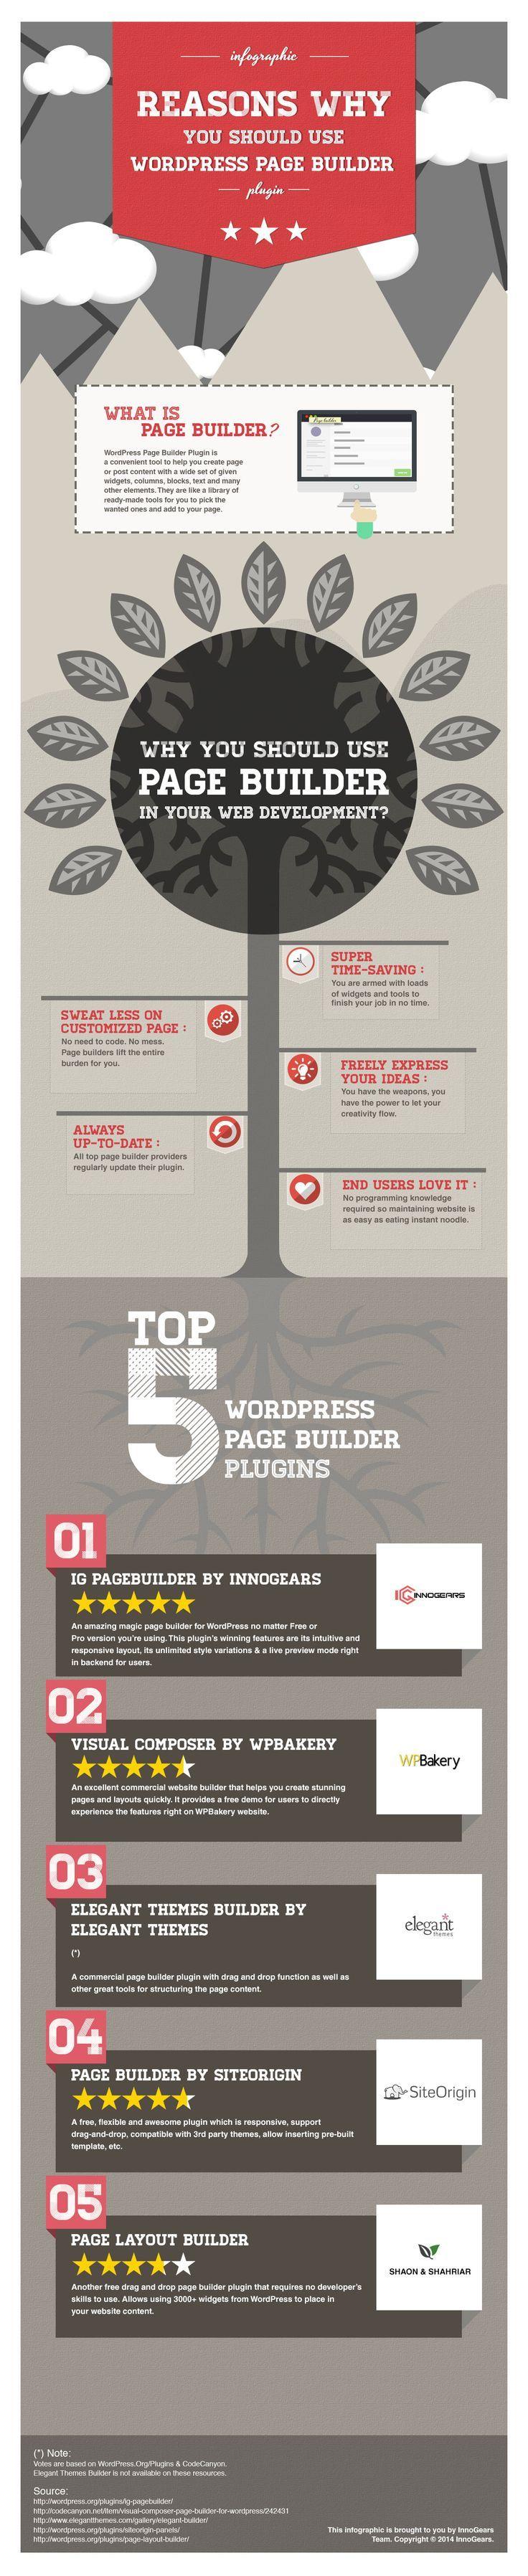 TOP 5 WORDPRESS PAGE BUILDER PLUGINS [INFOGRAPHIC]